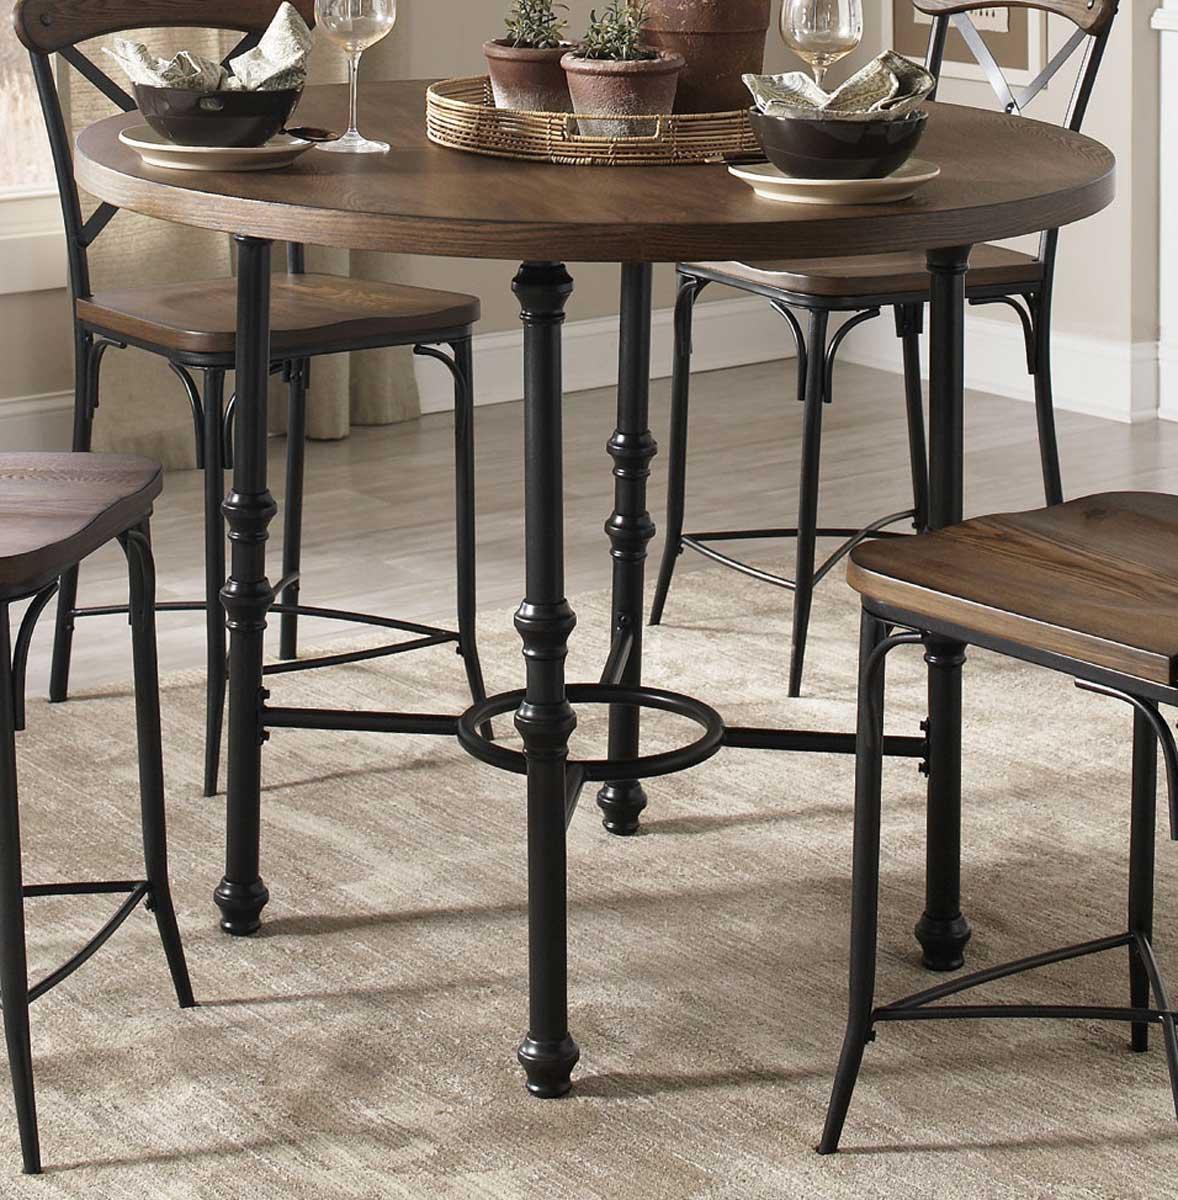 Coaster Monticello Counter Height Dining Set - Vintage Ash/Matte Black ...